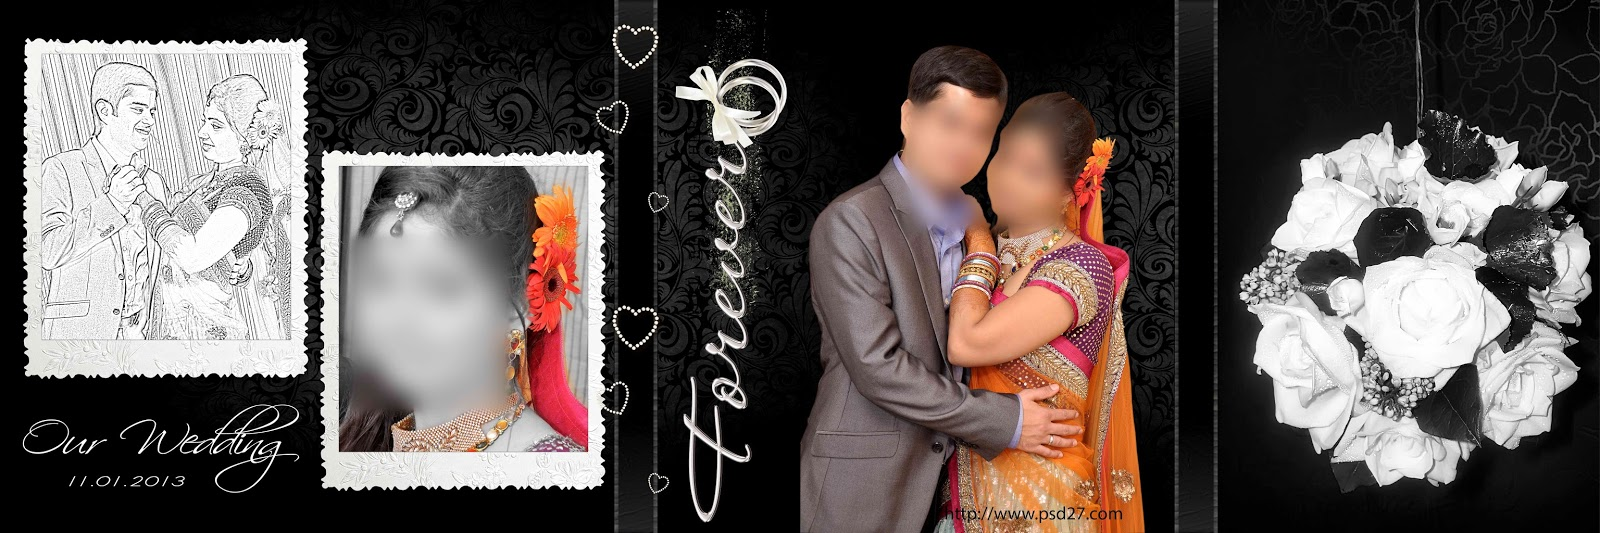 Creative Wedding Album Psd Formed Collection Download - StudioPk